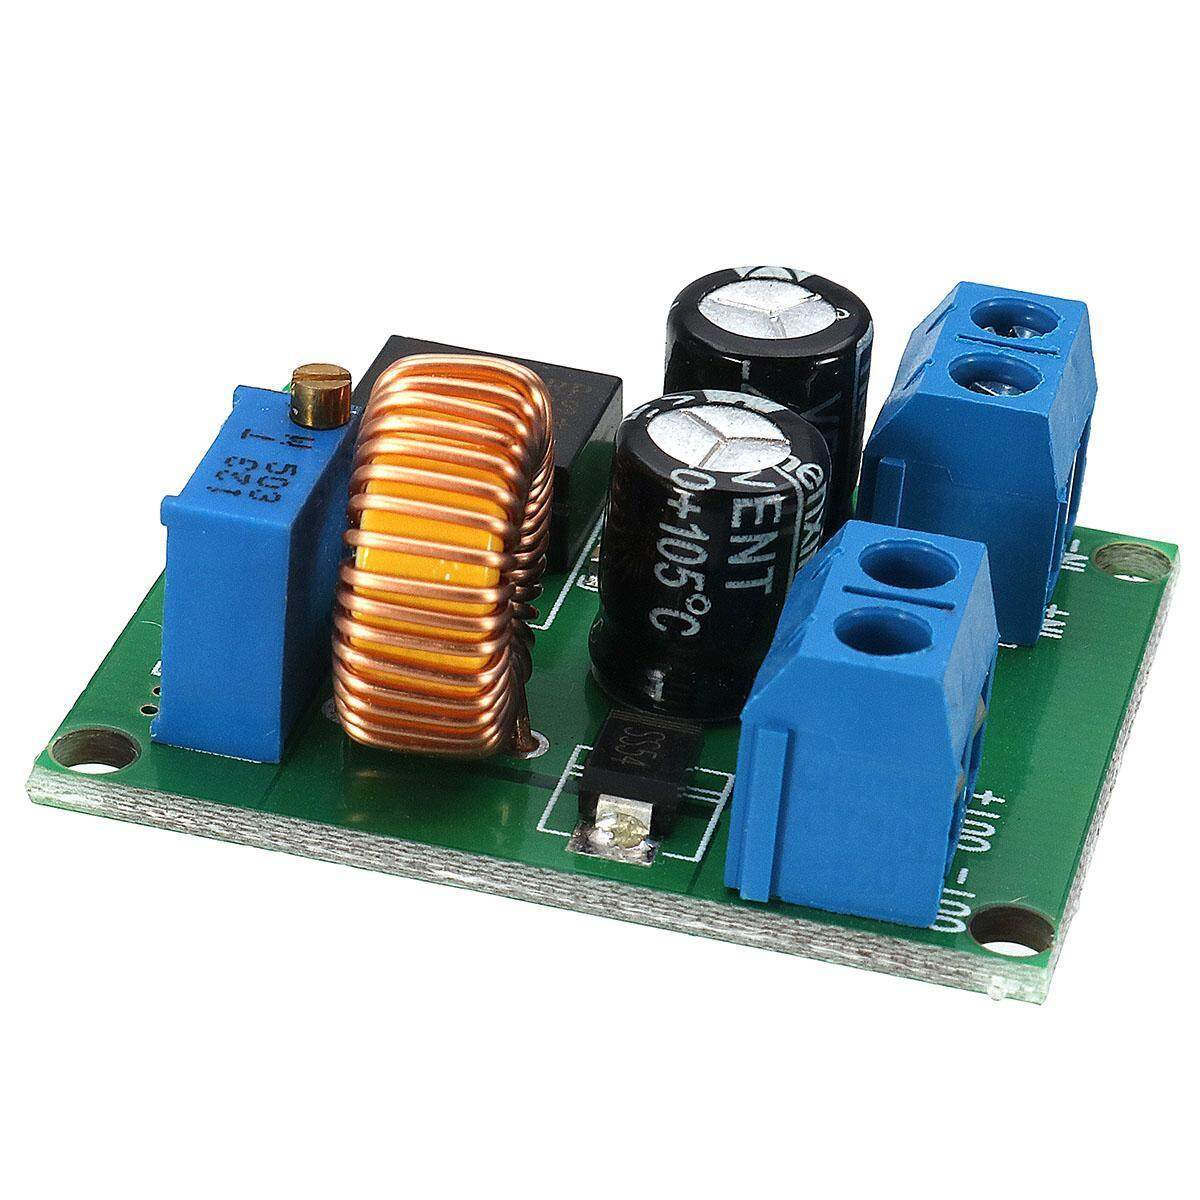 1 xDC-DC 3V - 35V to 4V - 40V adjustable step up power module